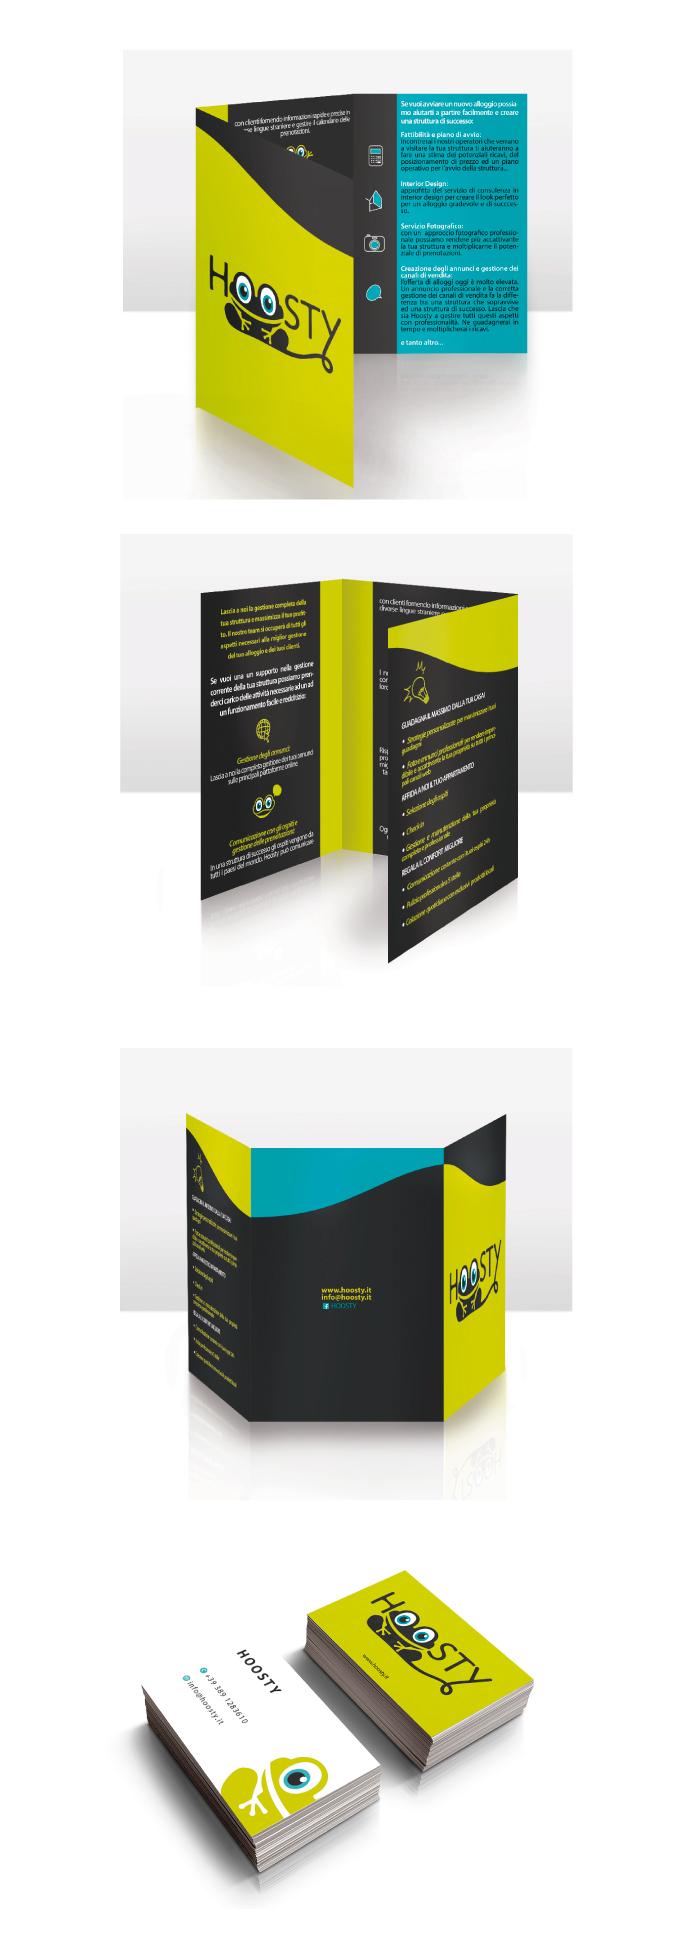 hoosty, brochure, biglietto da visita, design, graphic design, grafica, diana petrarca, Hoosty - Brochure e biglietto da visita